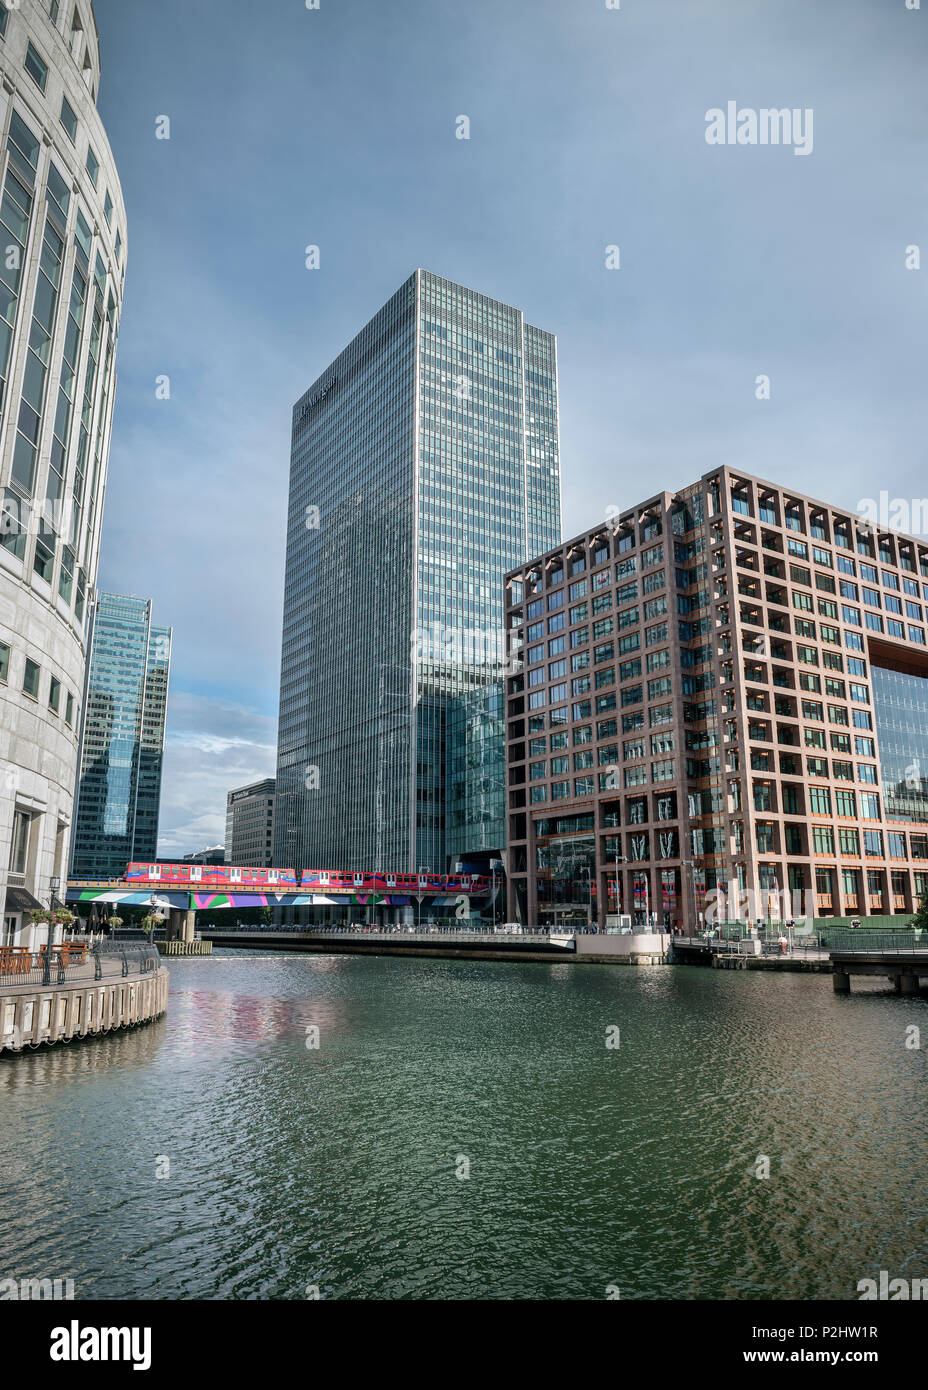 Blick Richtung Office Tower von J.P.Morgan, Canary Wharf neue Financial District, City of London, England, Vereinigtes Königreich, Europa Stockbild